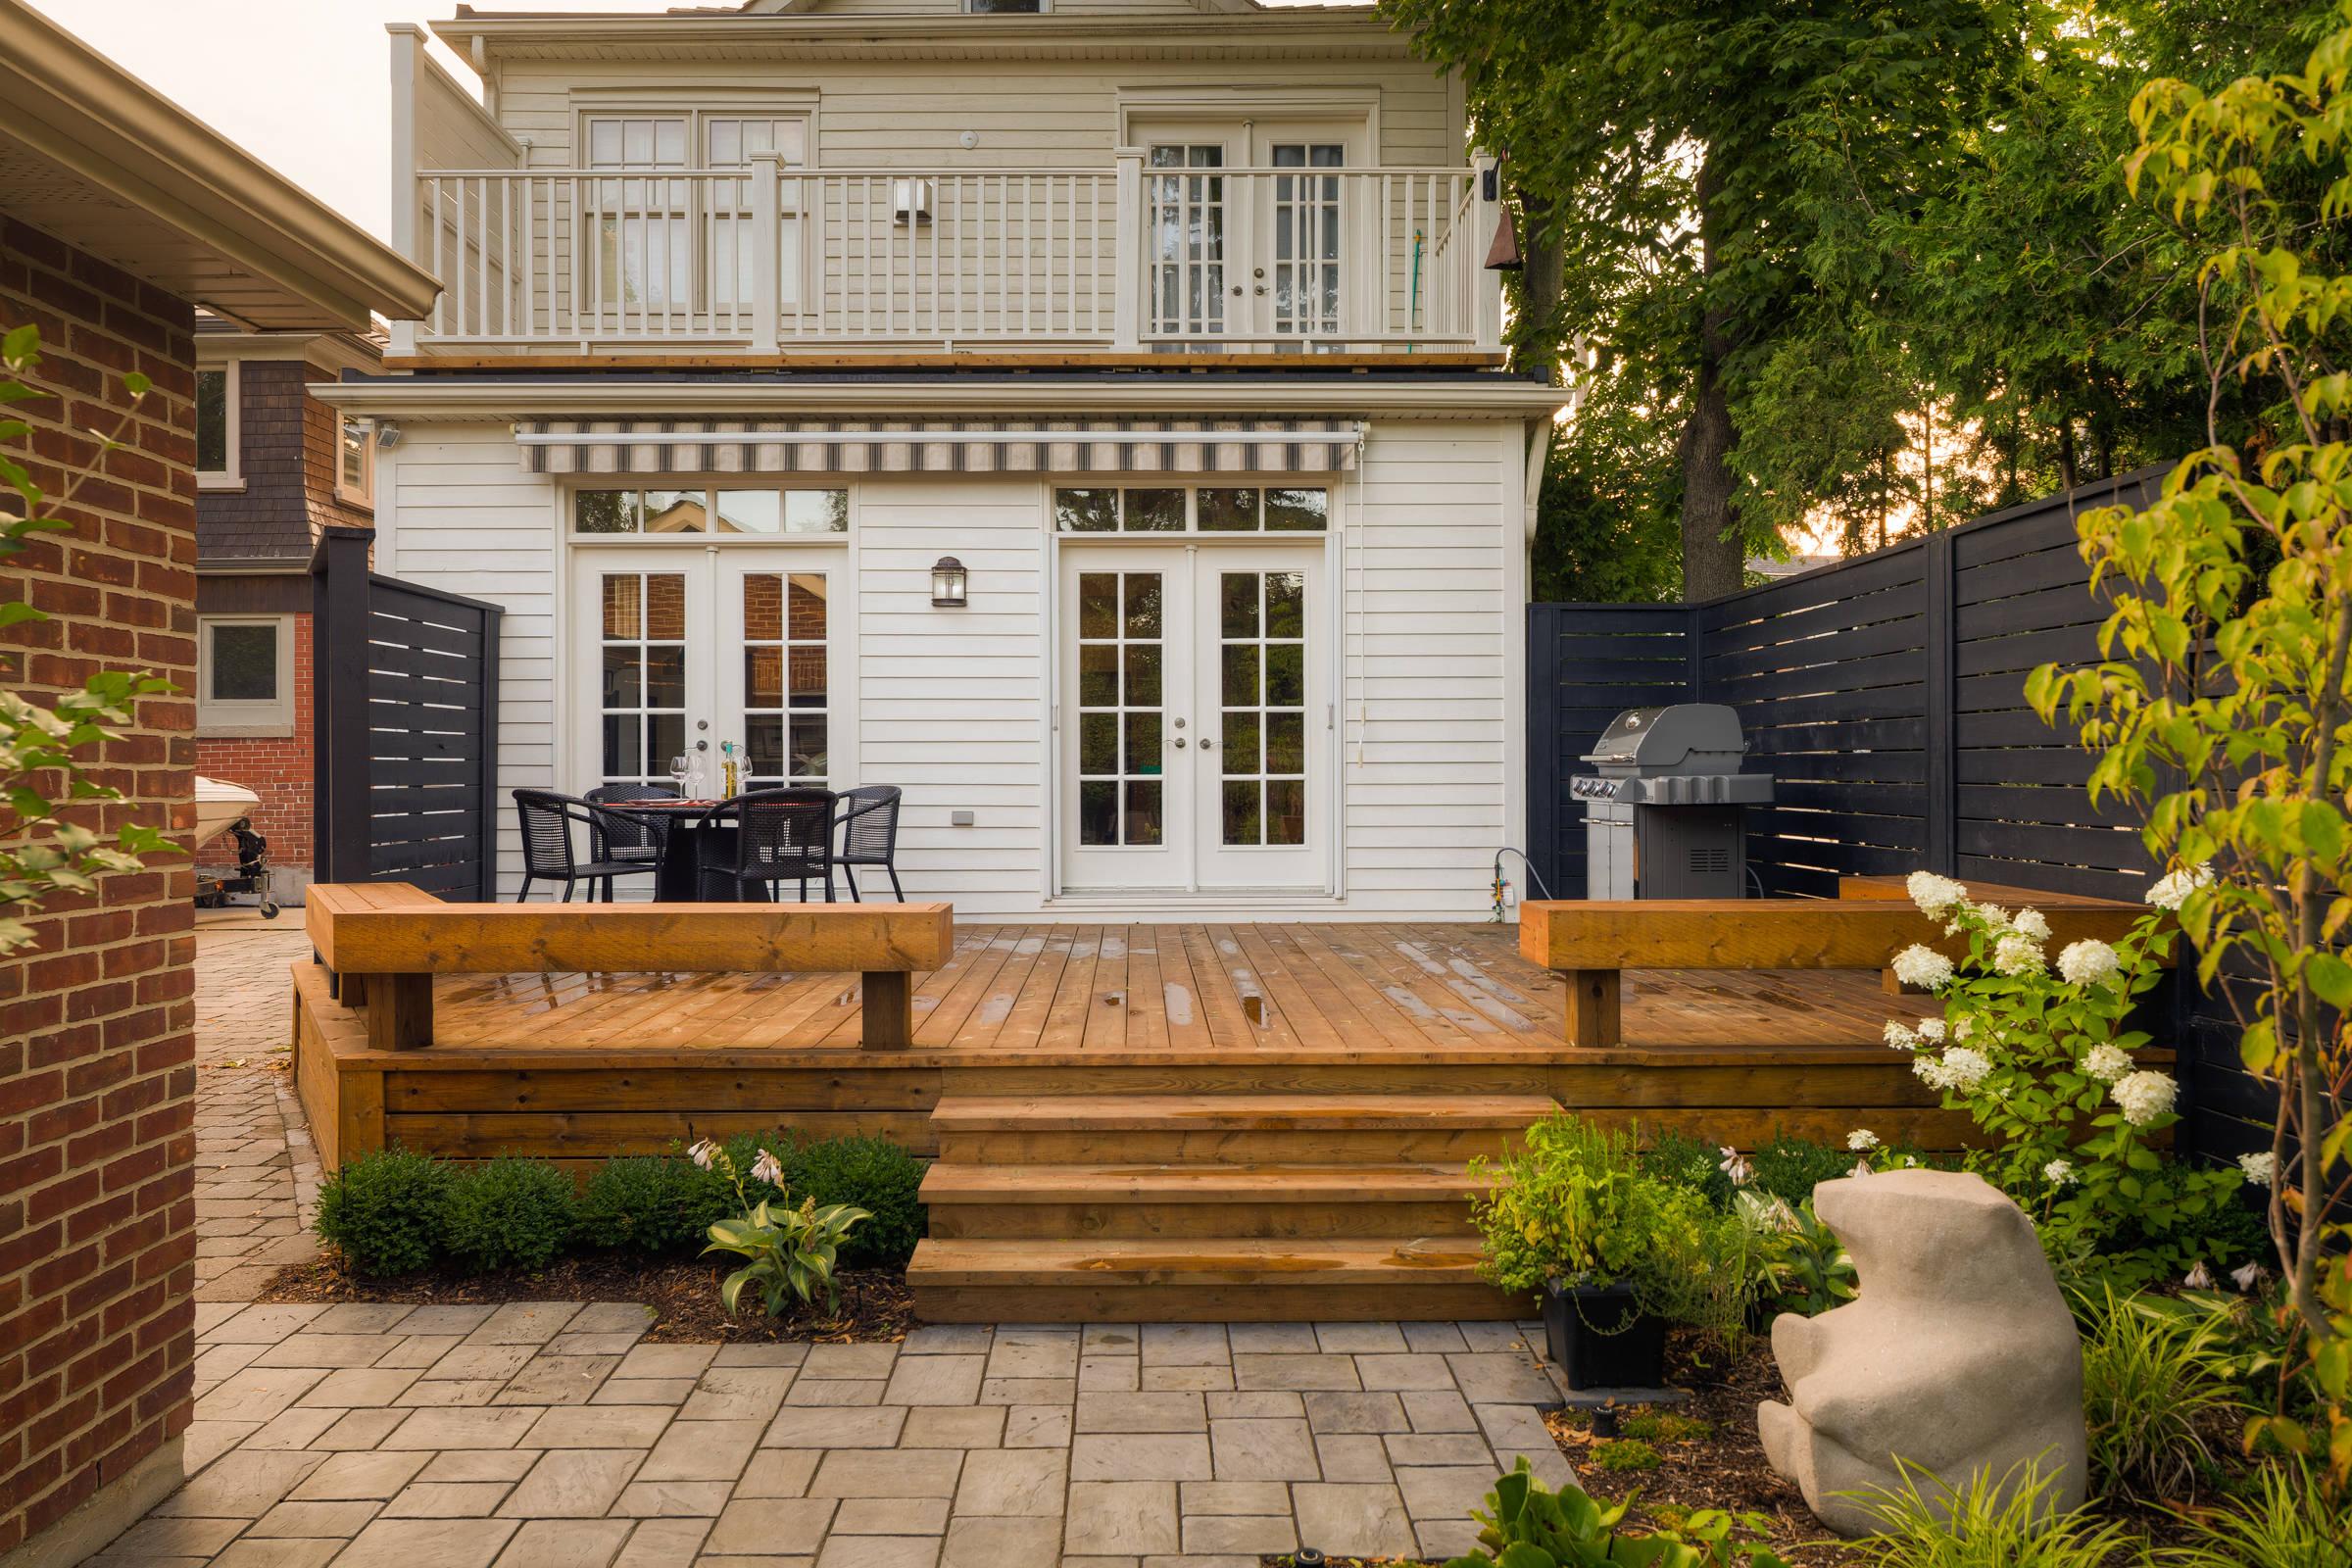 Bloor West Village Backyard Makeover